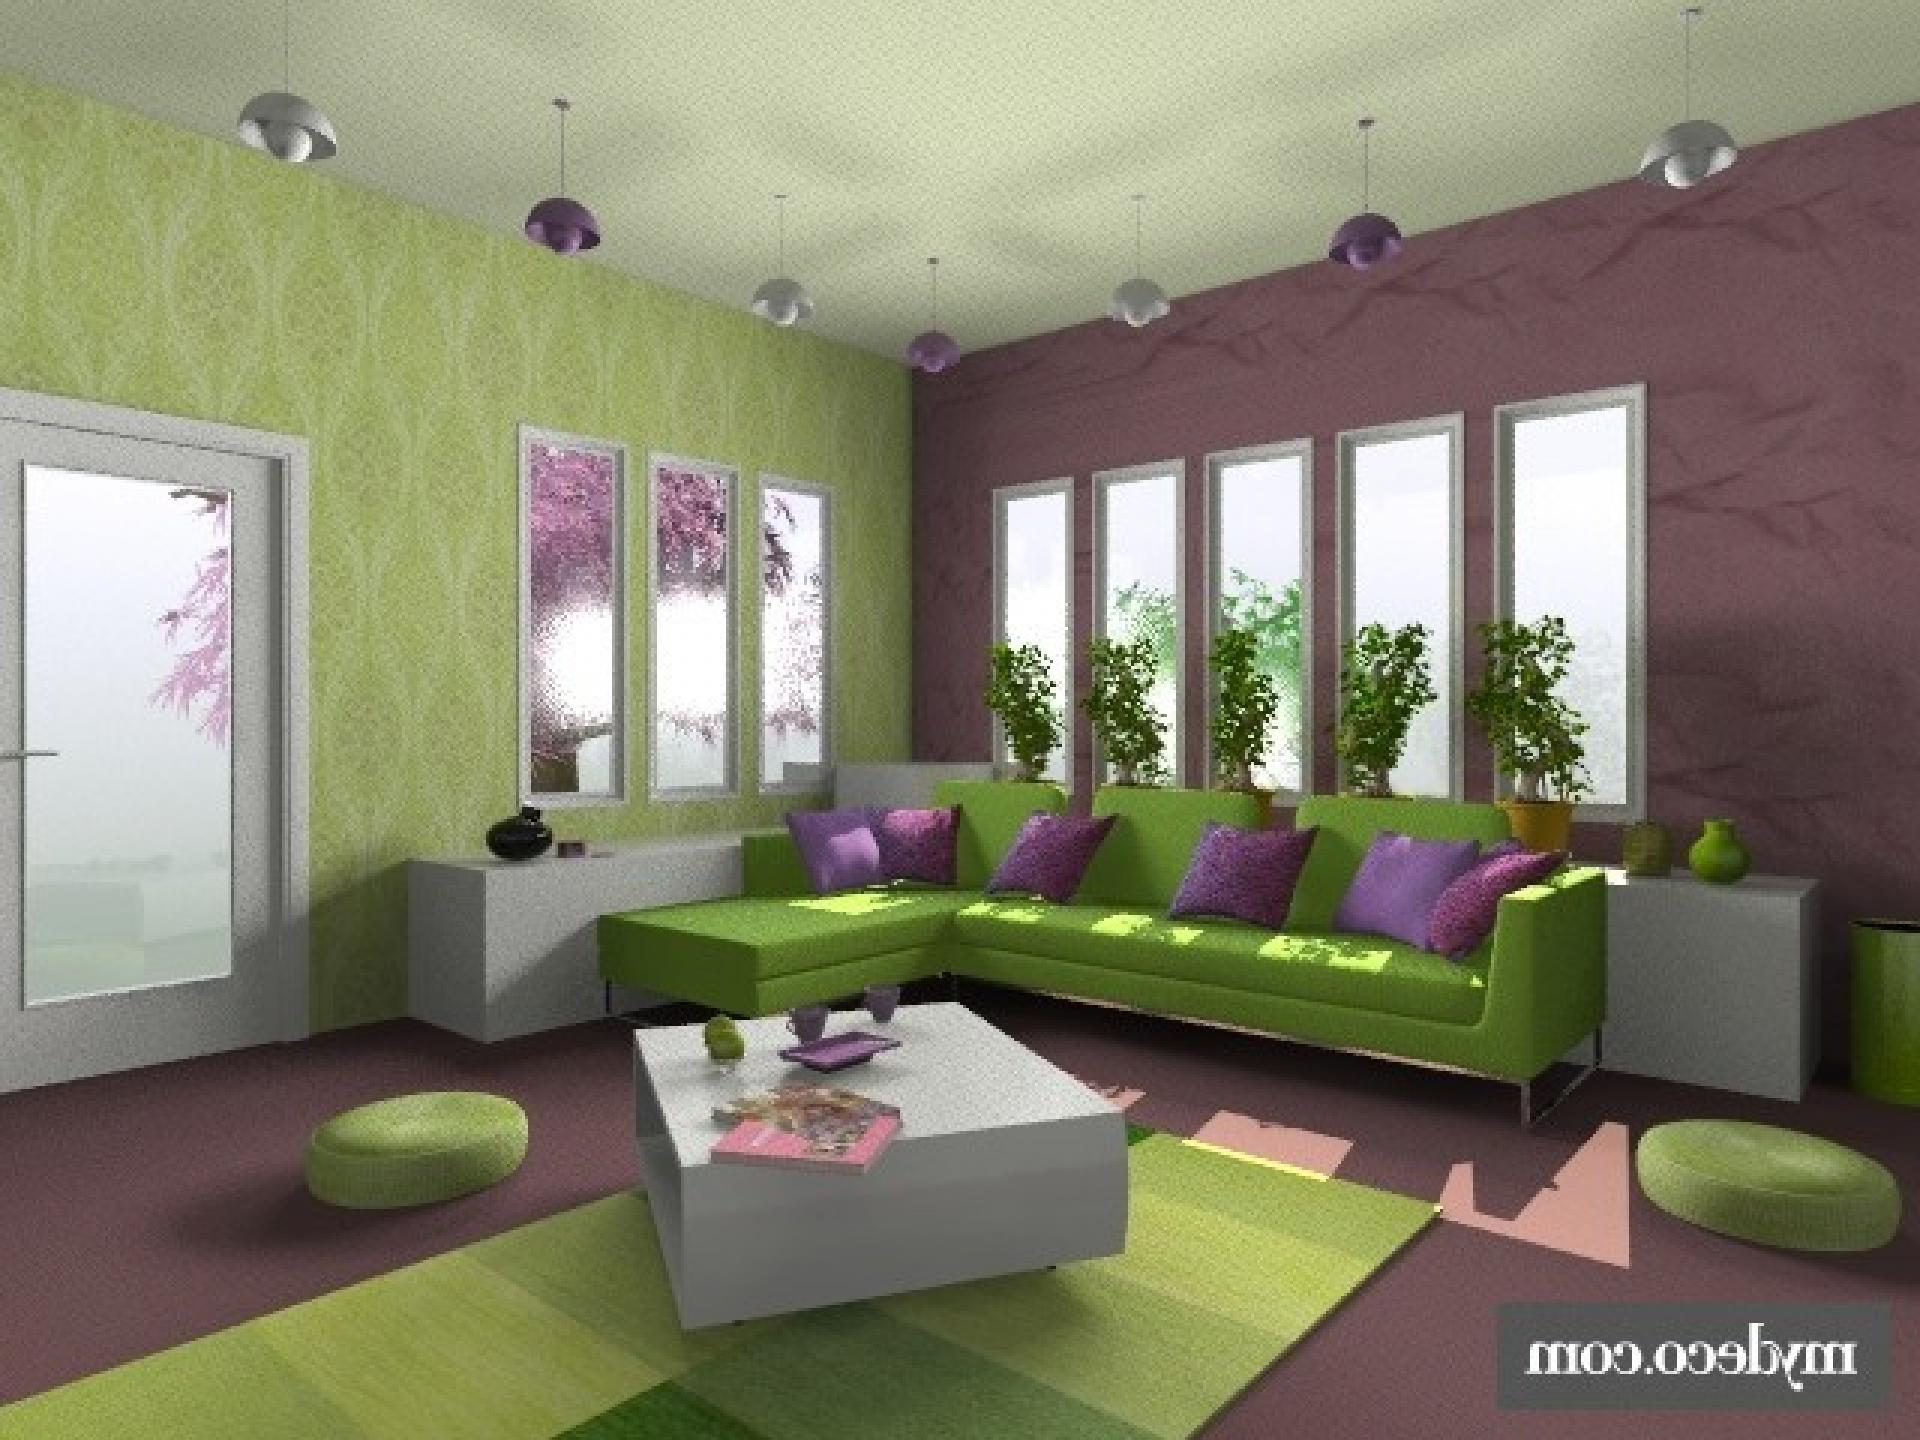 bedroom color design online Interior Purple Wall Paint House Ideas Yellow Color Design Living  1440 X 1920